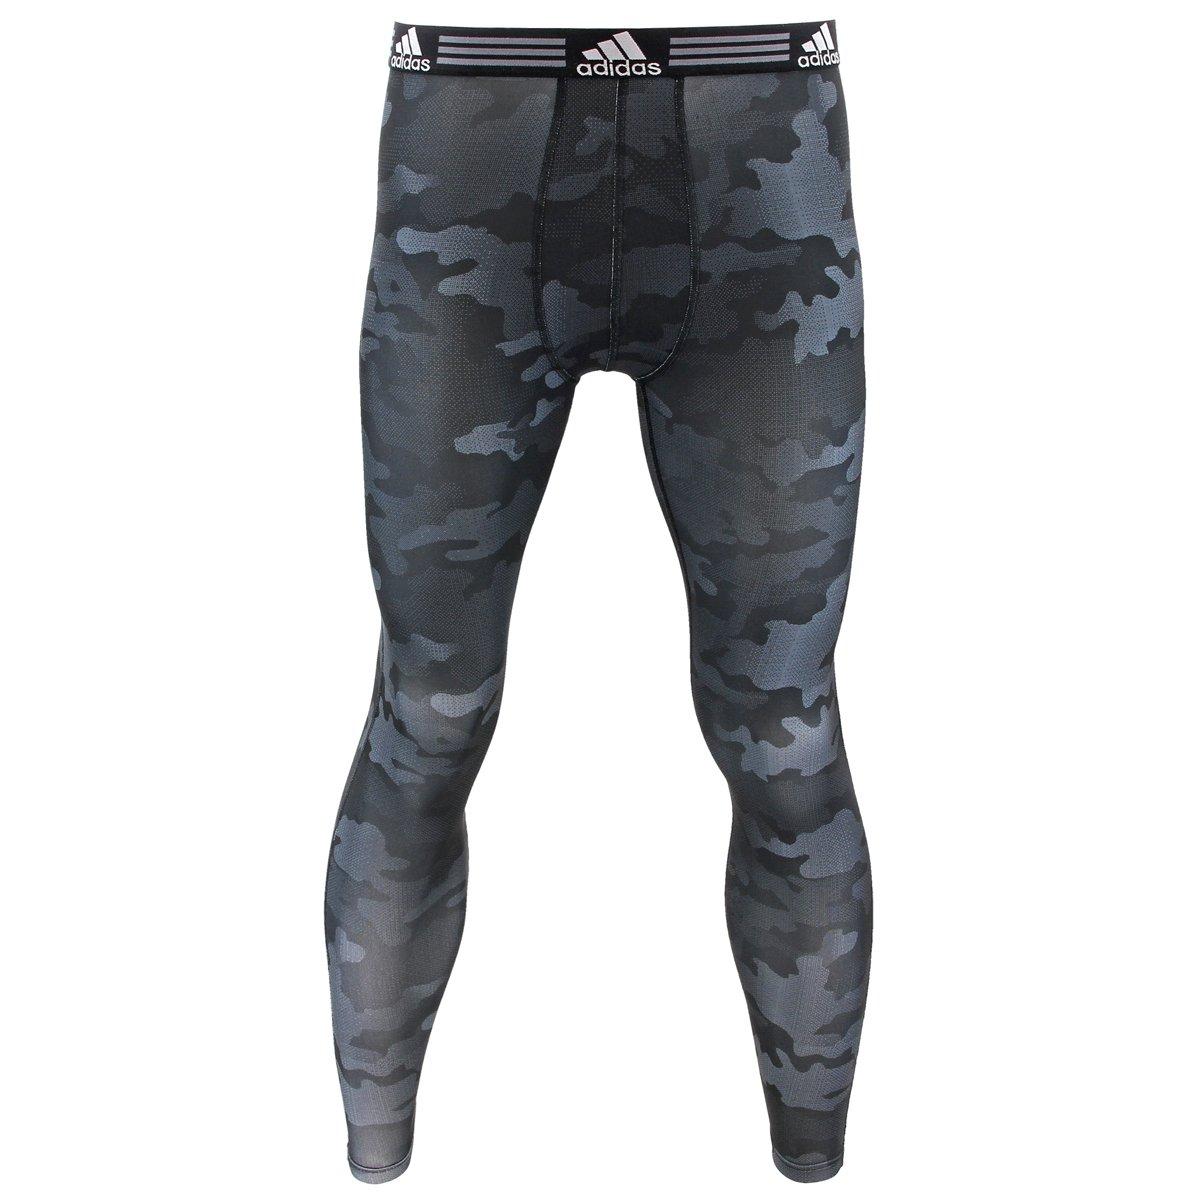 Adidas Herren Baselayer Climalite UPF Hose